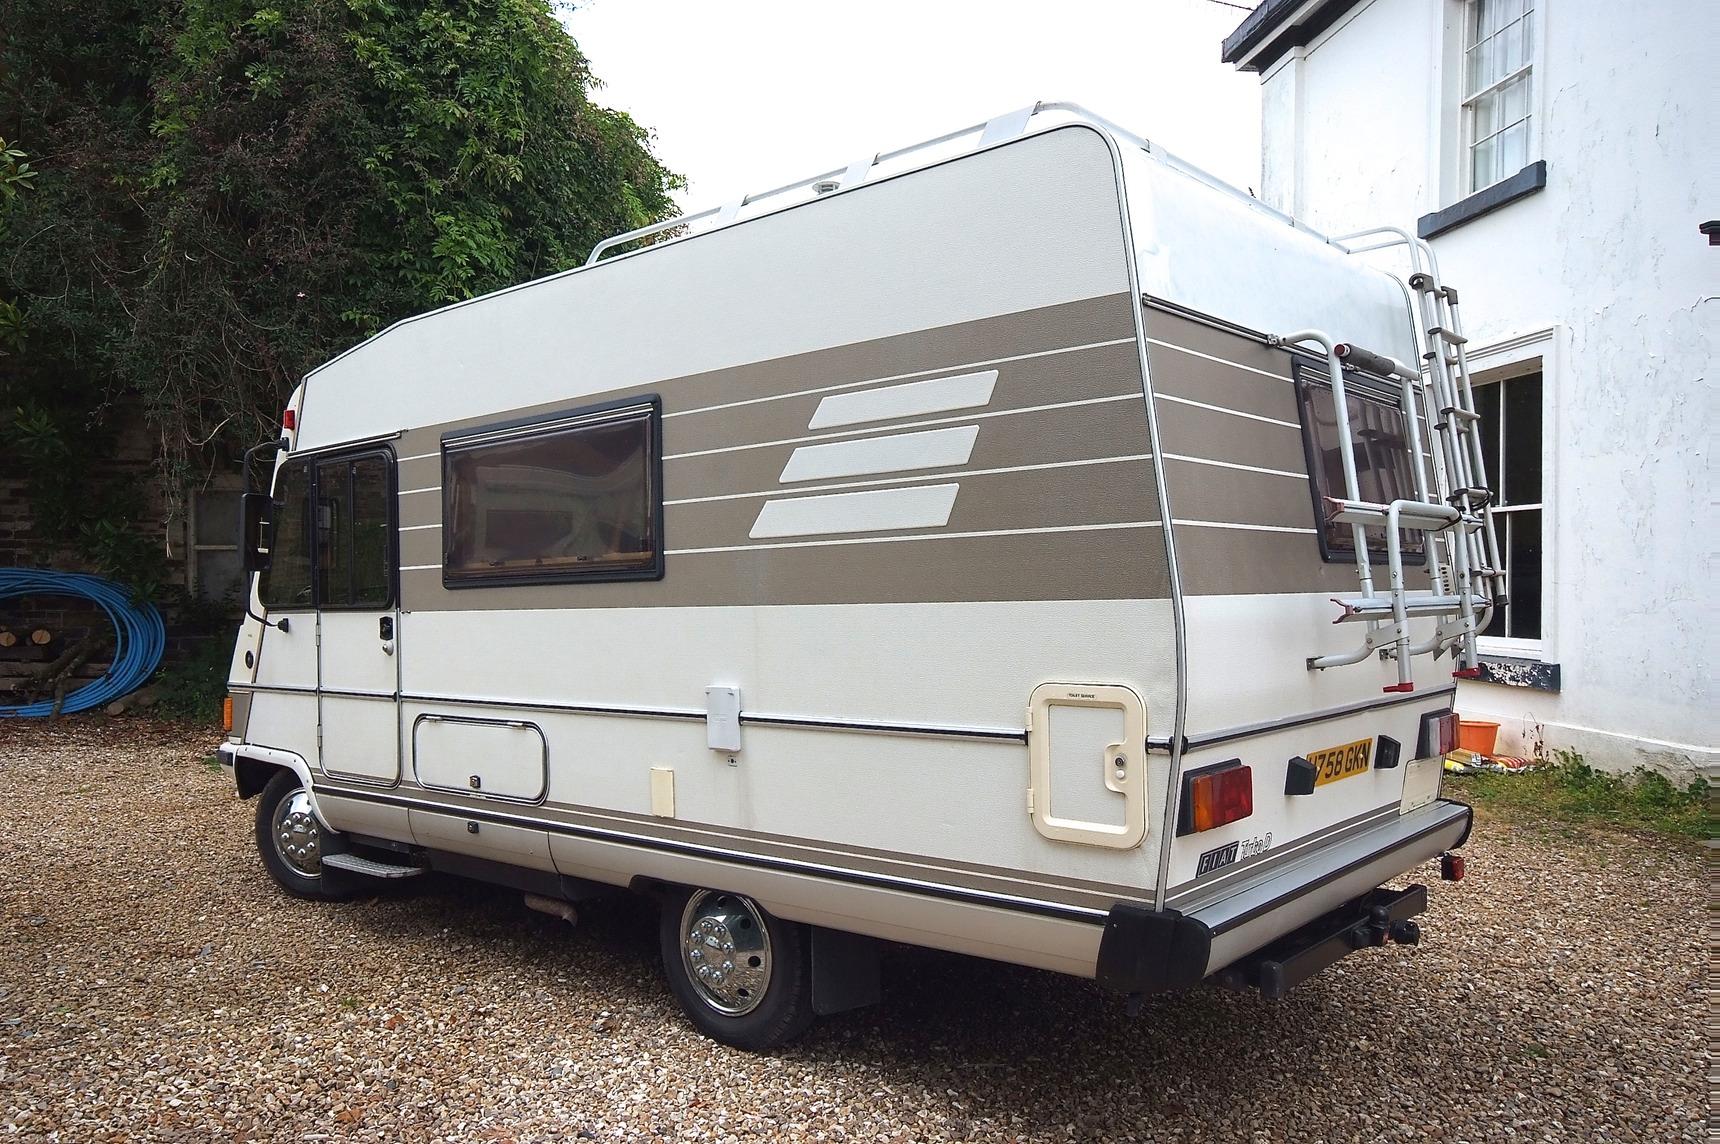 Sold Hymer B544 Lhd 1990 Fiat 2 5 Td Fsh 1 Previous